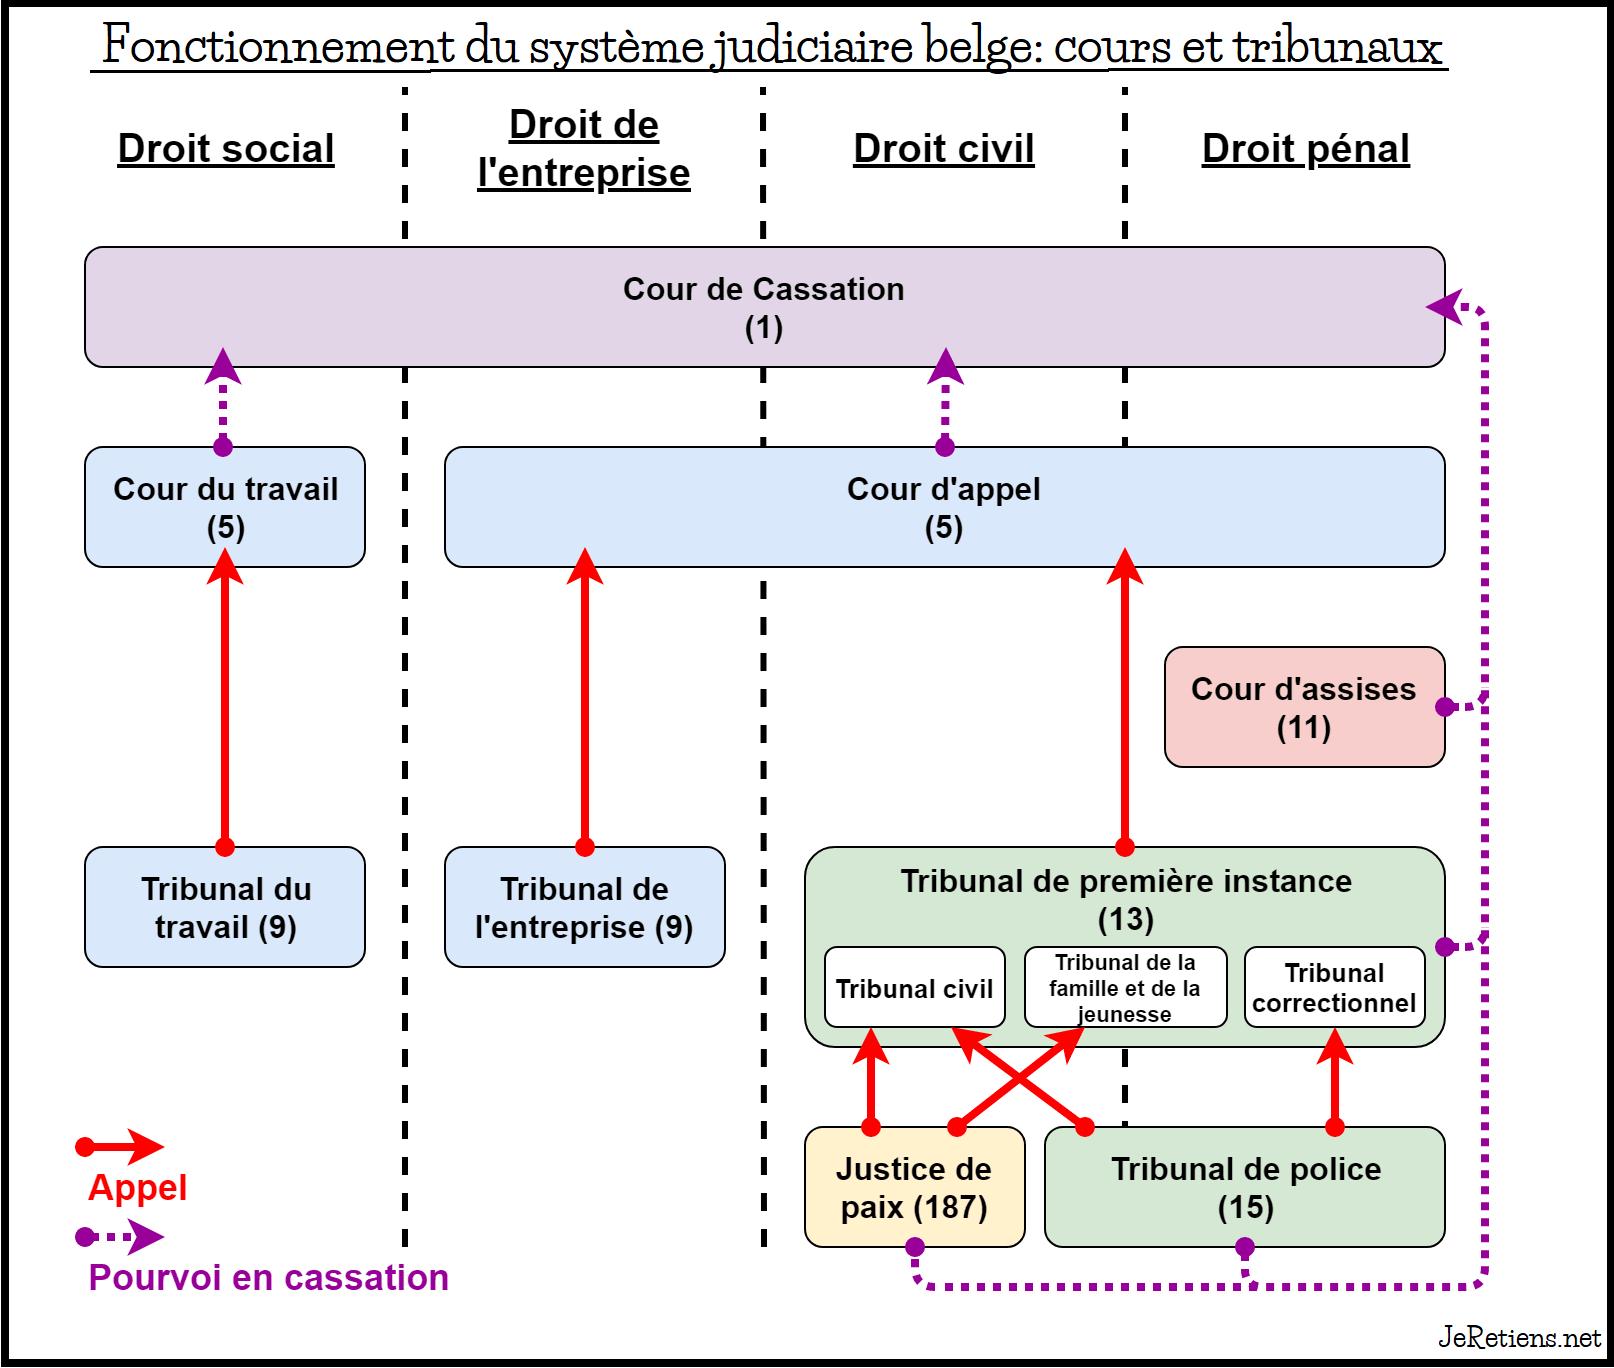 Schéma de l'organisation judiciaire en Belgique